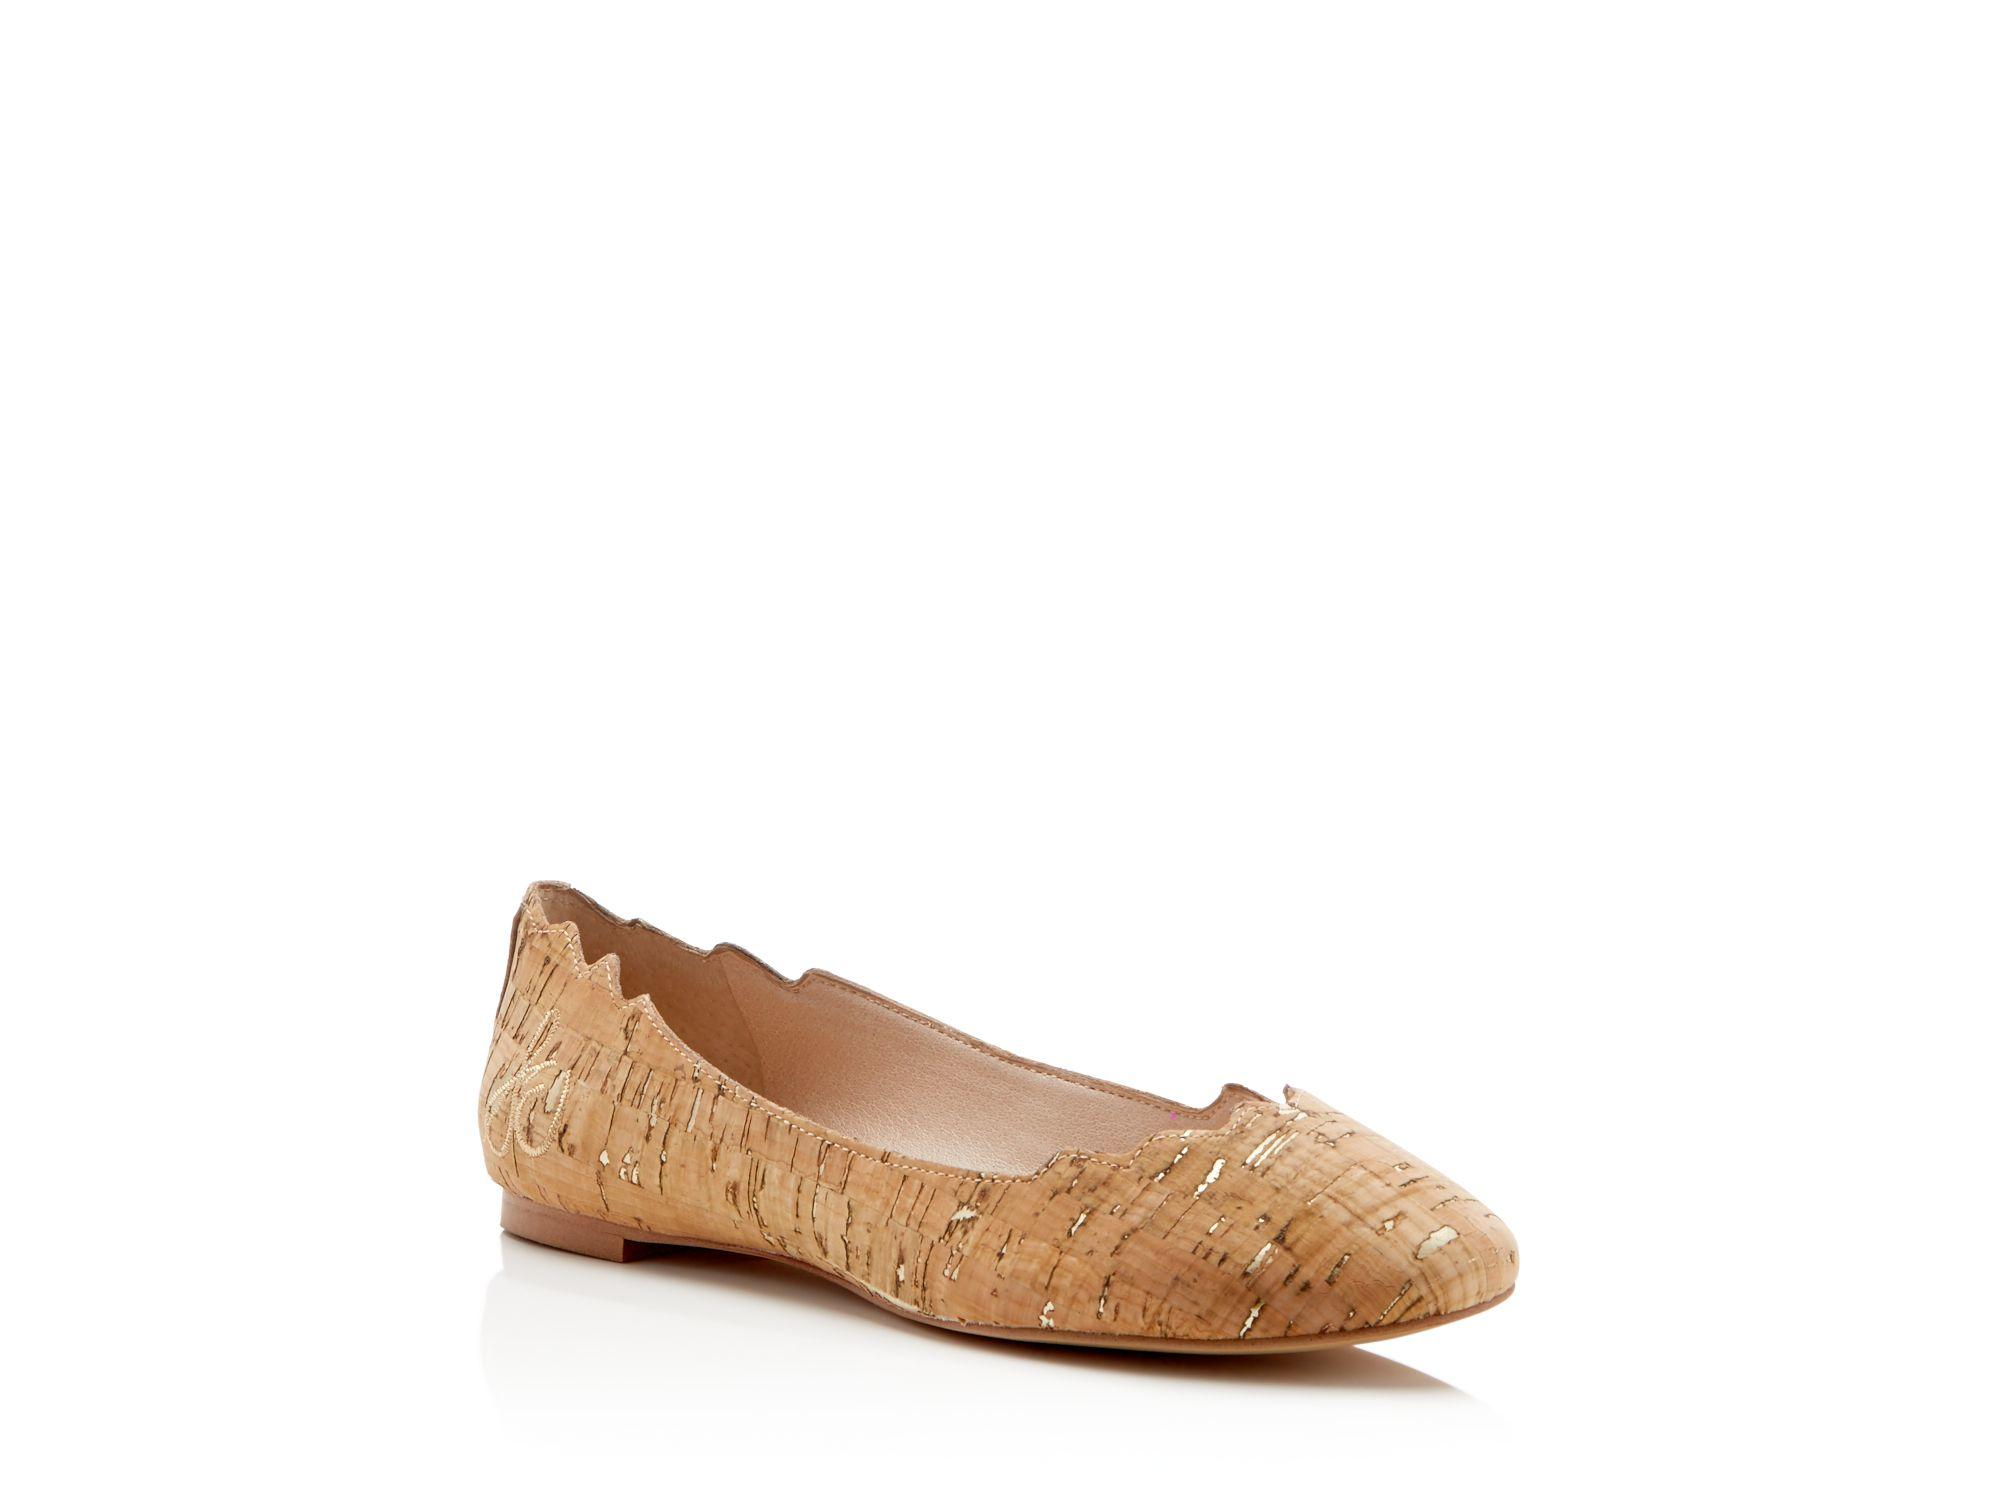 7ea6726bea041 Lyst - Sam Edelman Augusta Cork Scallop-edge Ballet Flats in Brown